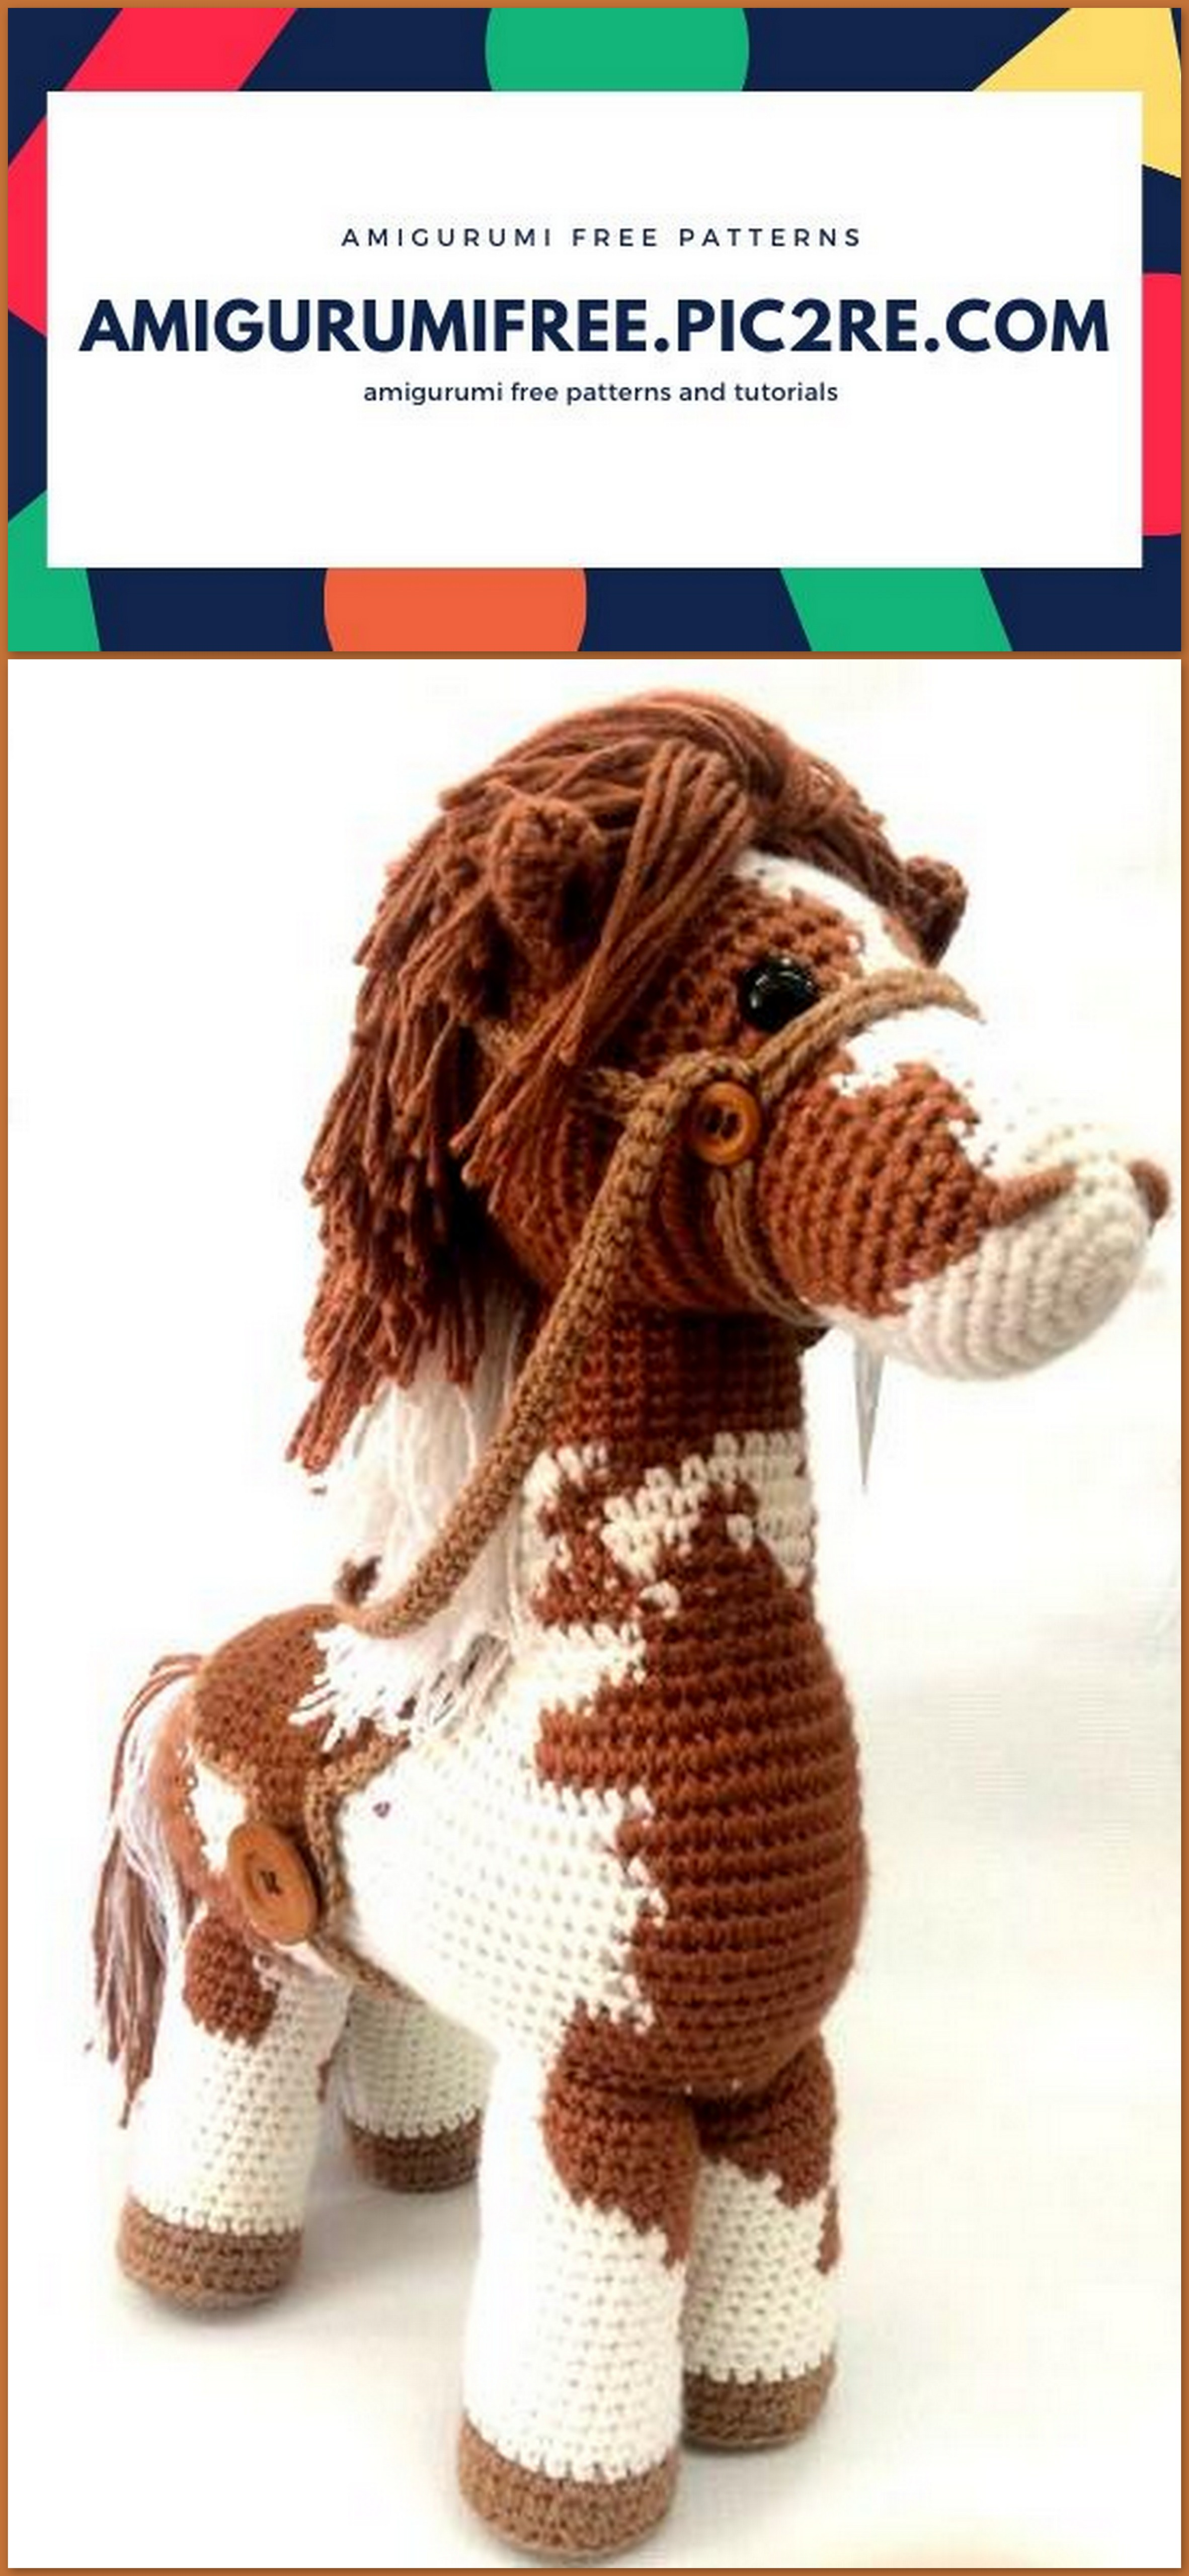 Free: Anime Hatsune miku Crochet Doll Pattern - Crochet - Listia ... | 5120x2363